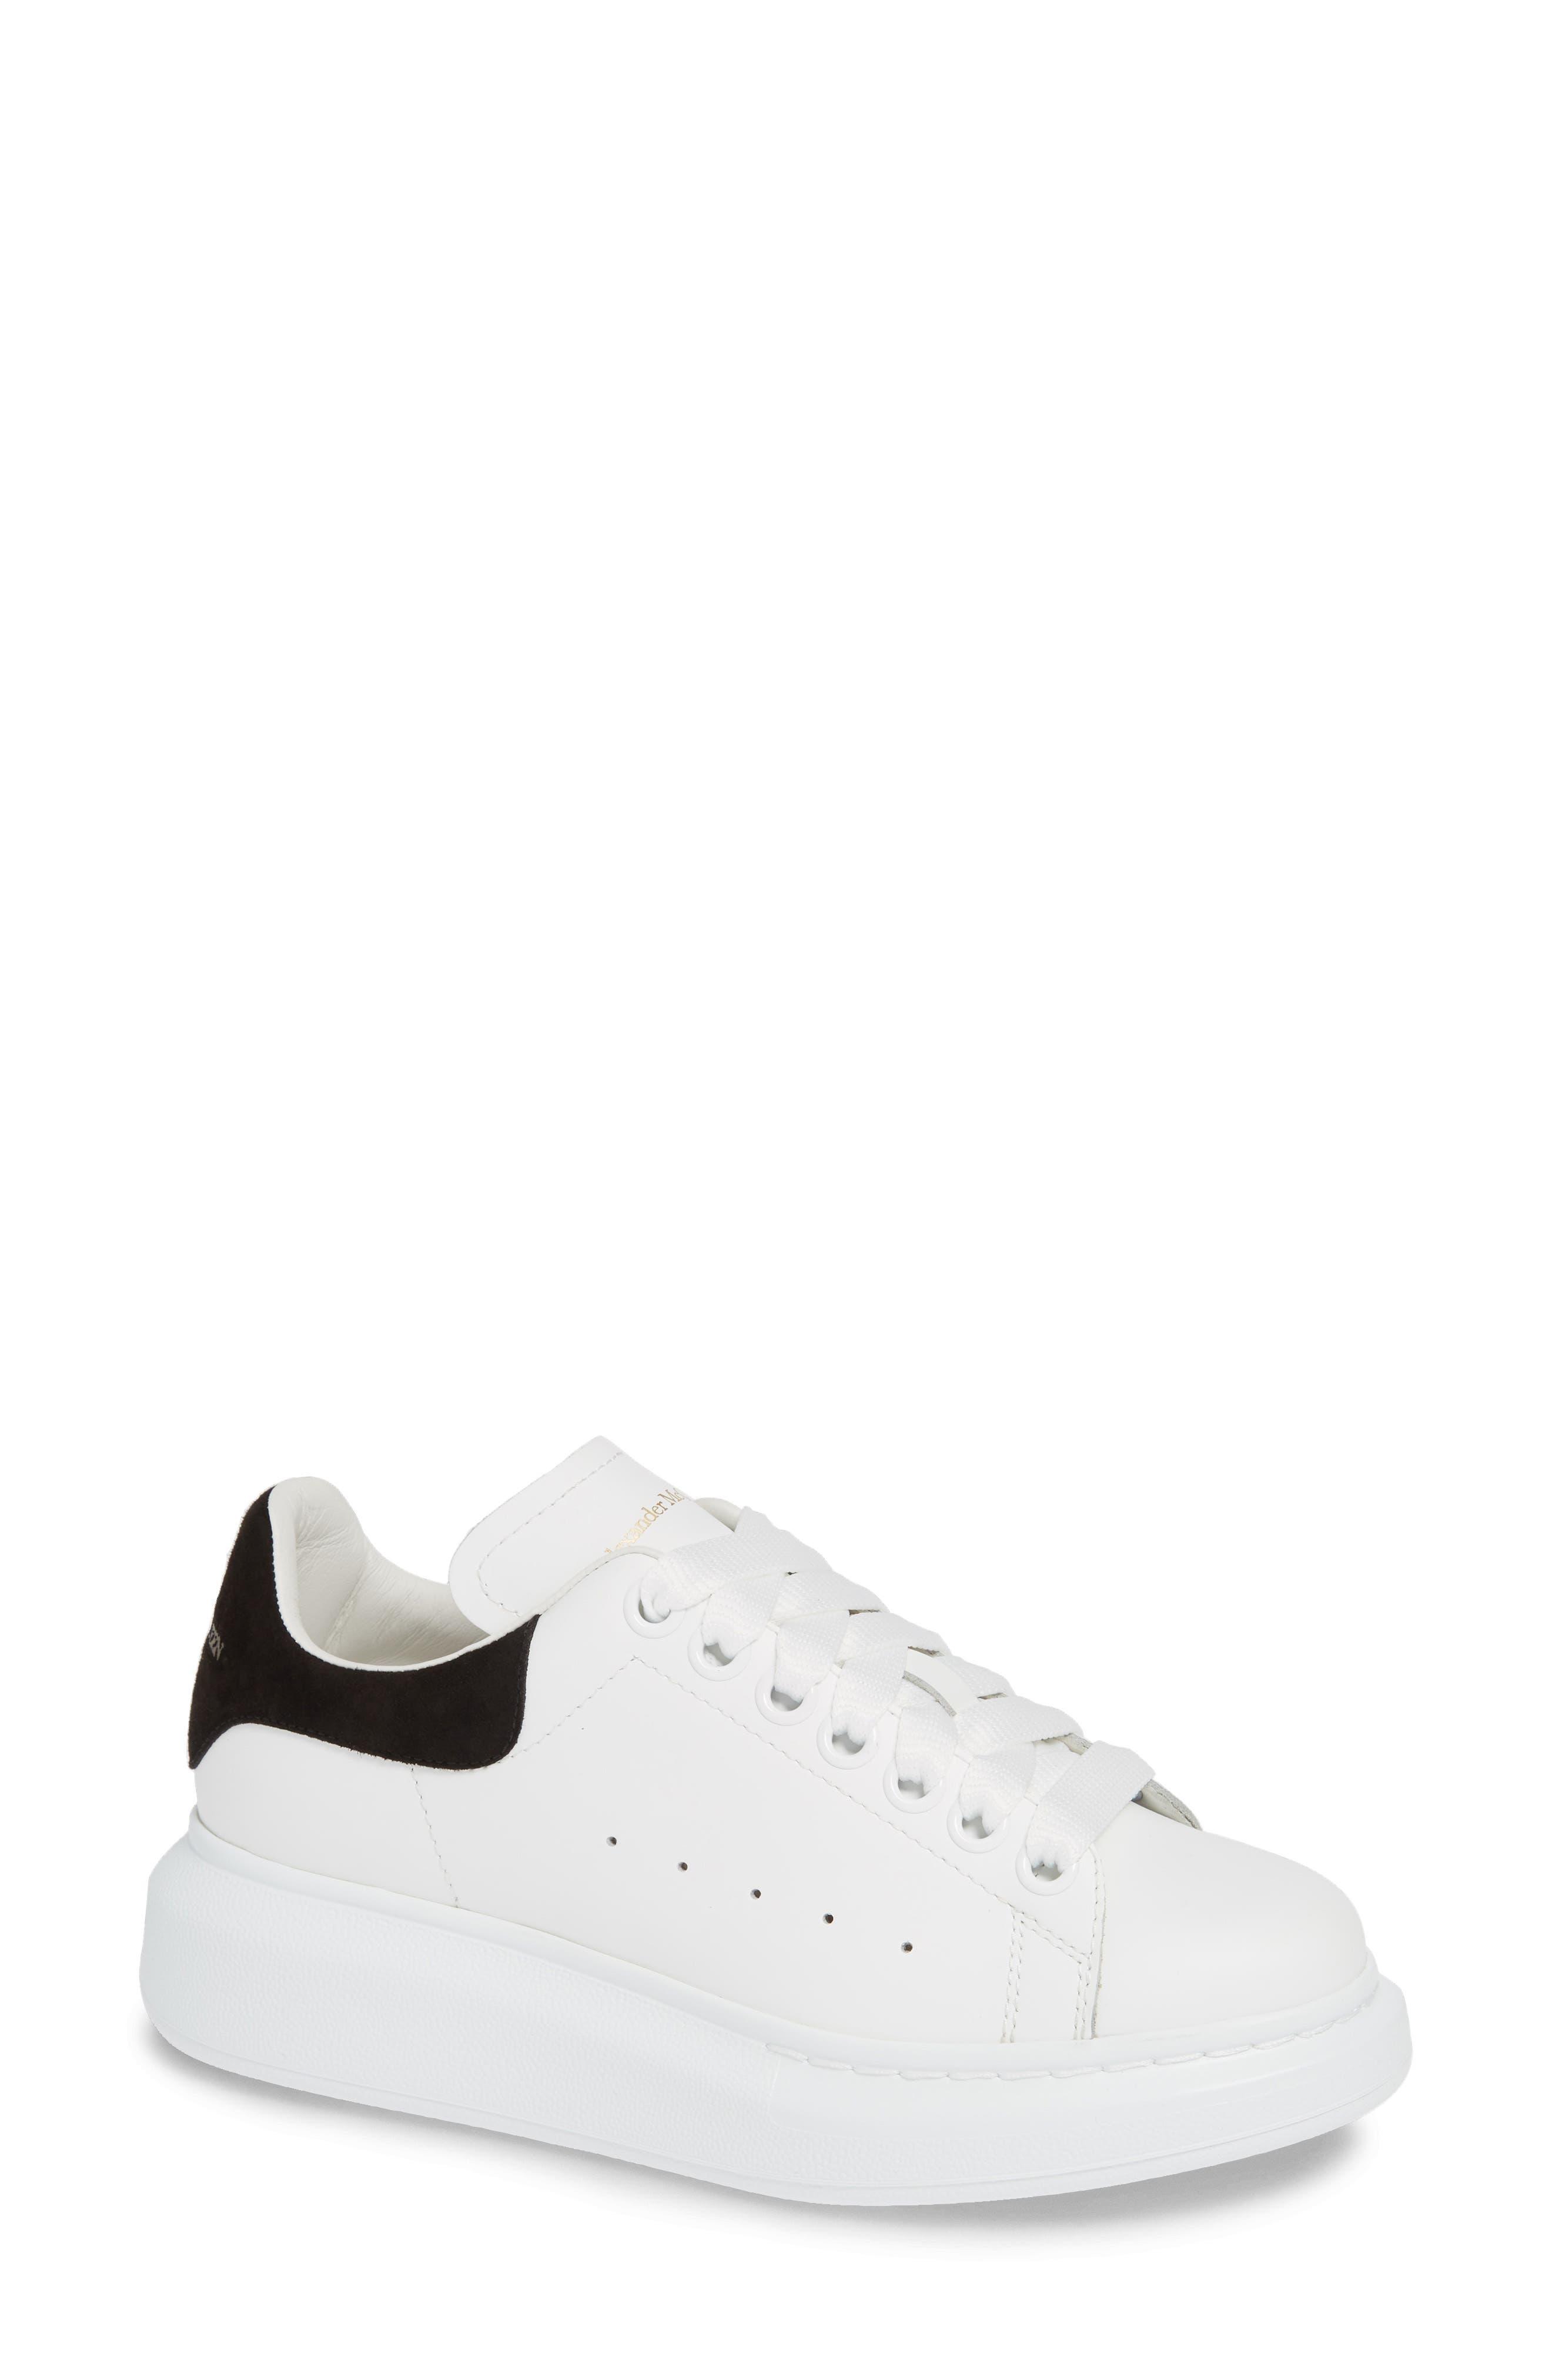 ALEXANDER MCQUEEN, Sneaker, Main thumbnail 1, color, WHITE BLACK